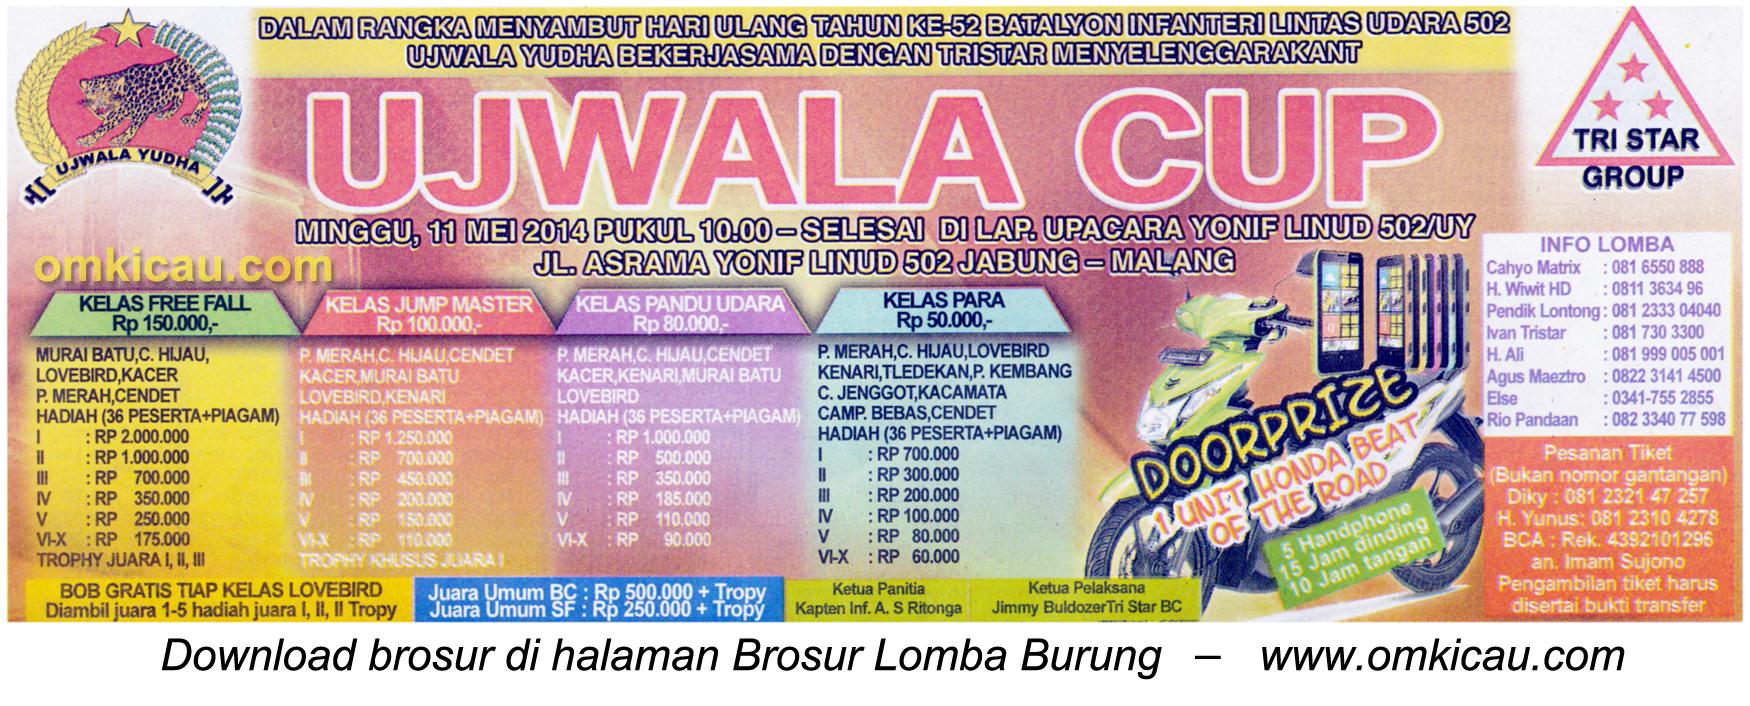 Brosur Lomba Burung Berkicau Ujwala Cup, Malang, 11 Mei 2014